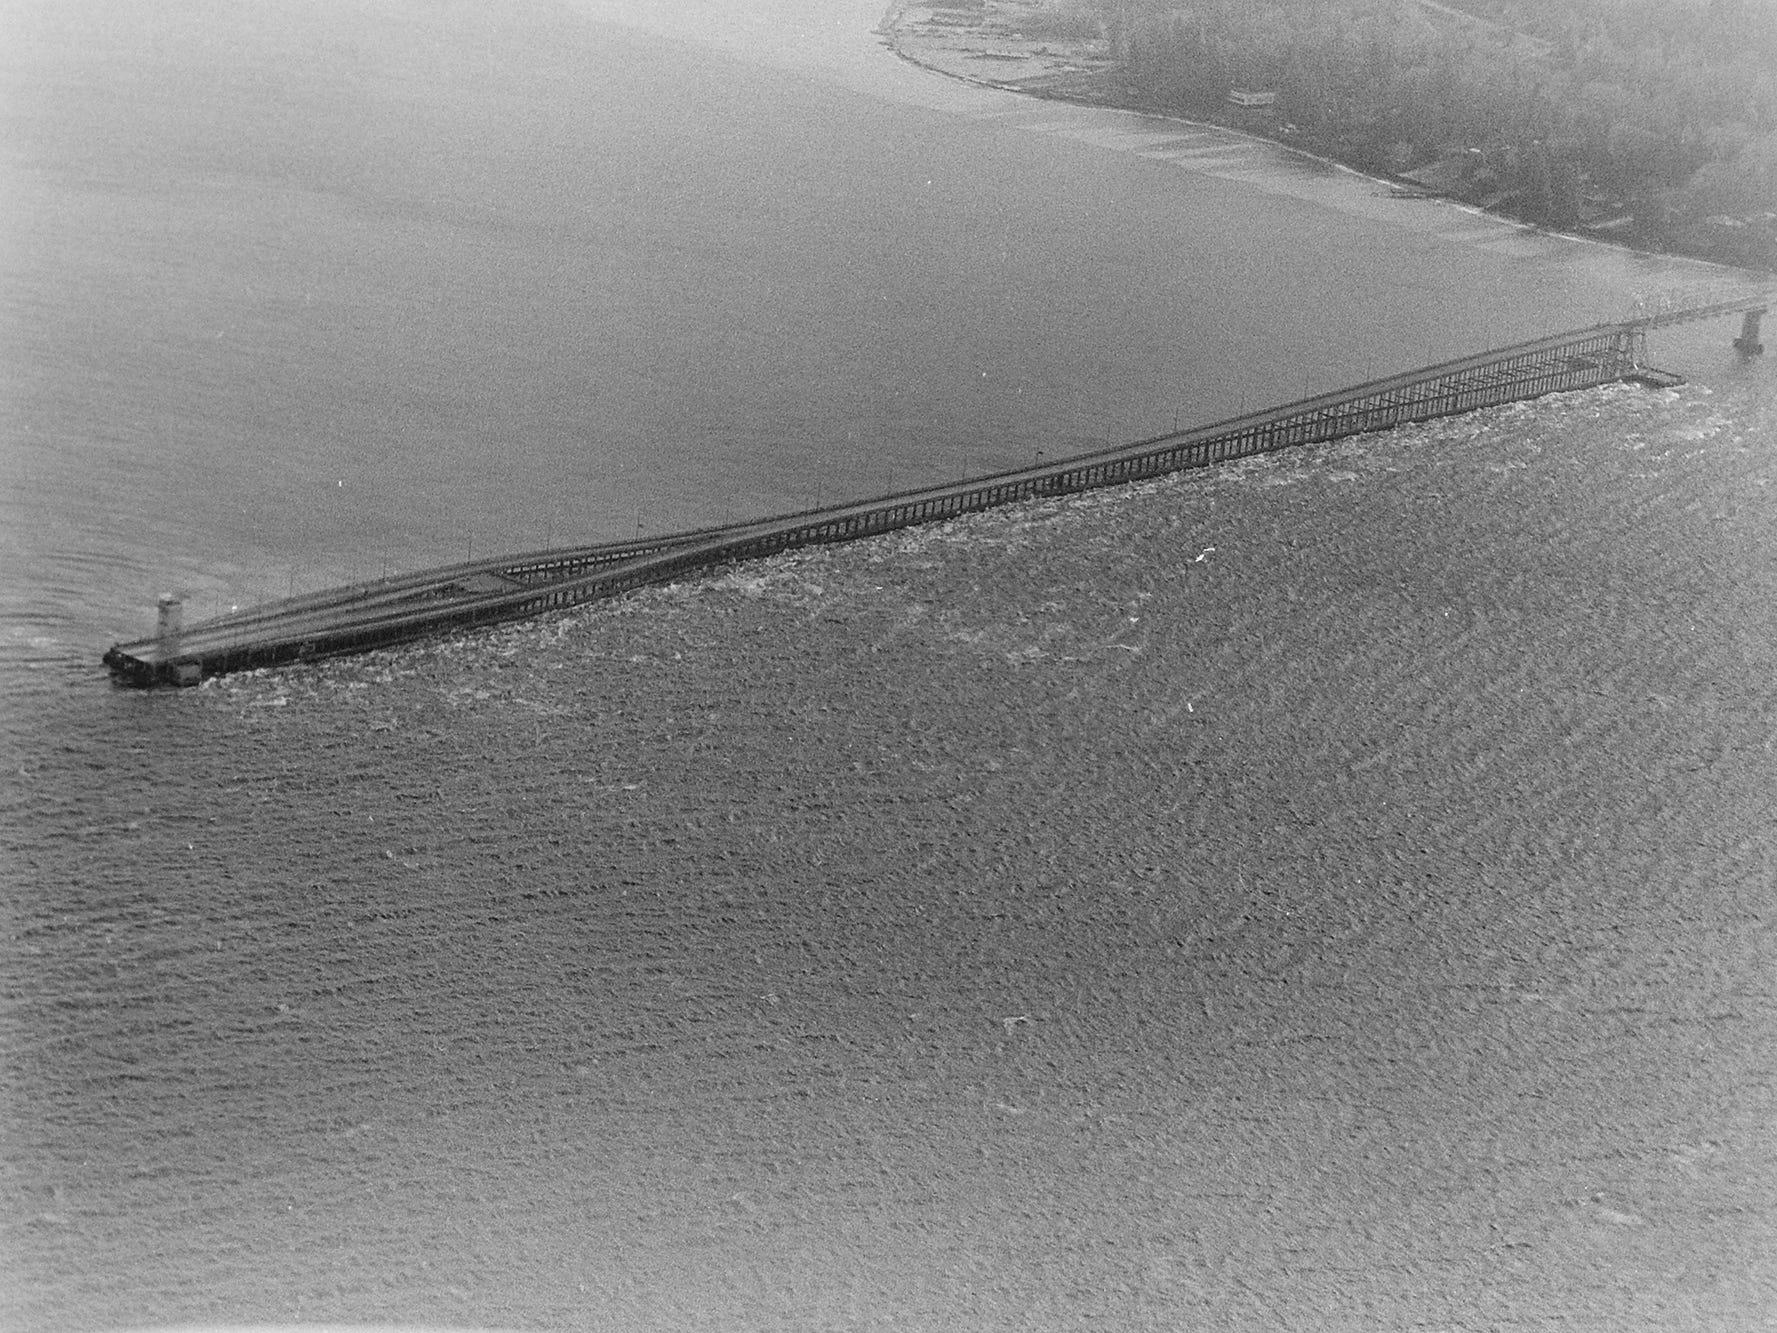 02/13/79Hood Canal Bridge